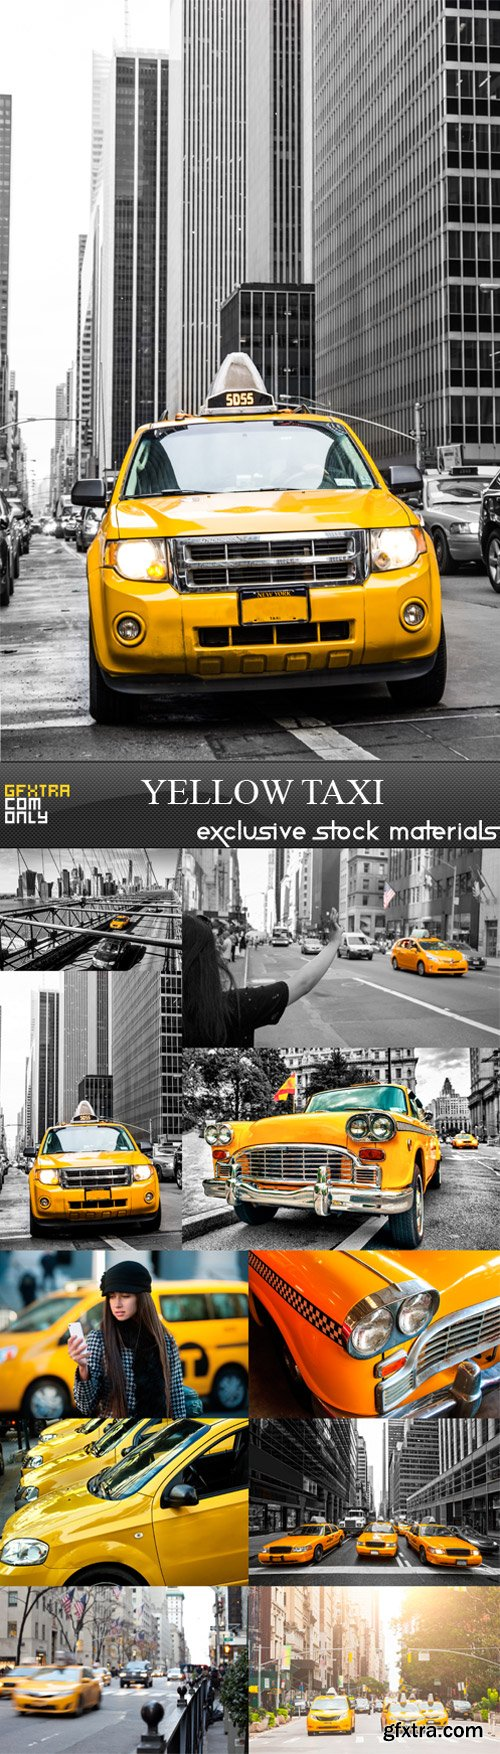 Yellow Taxi - 10 x JPEGs